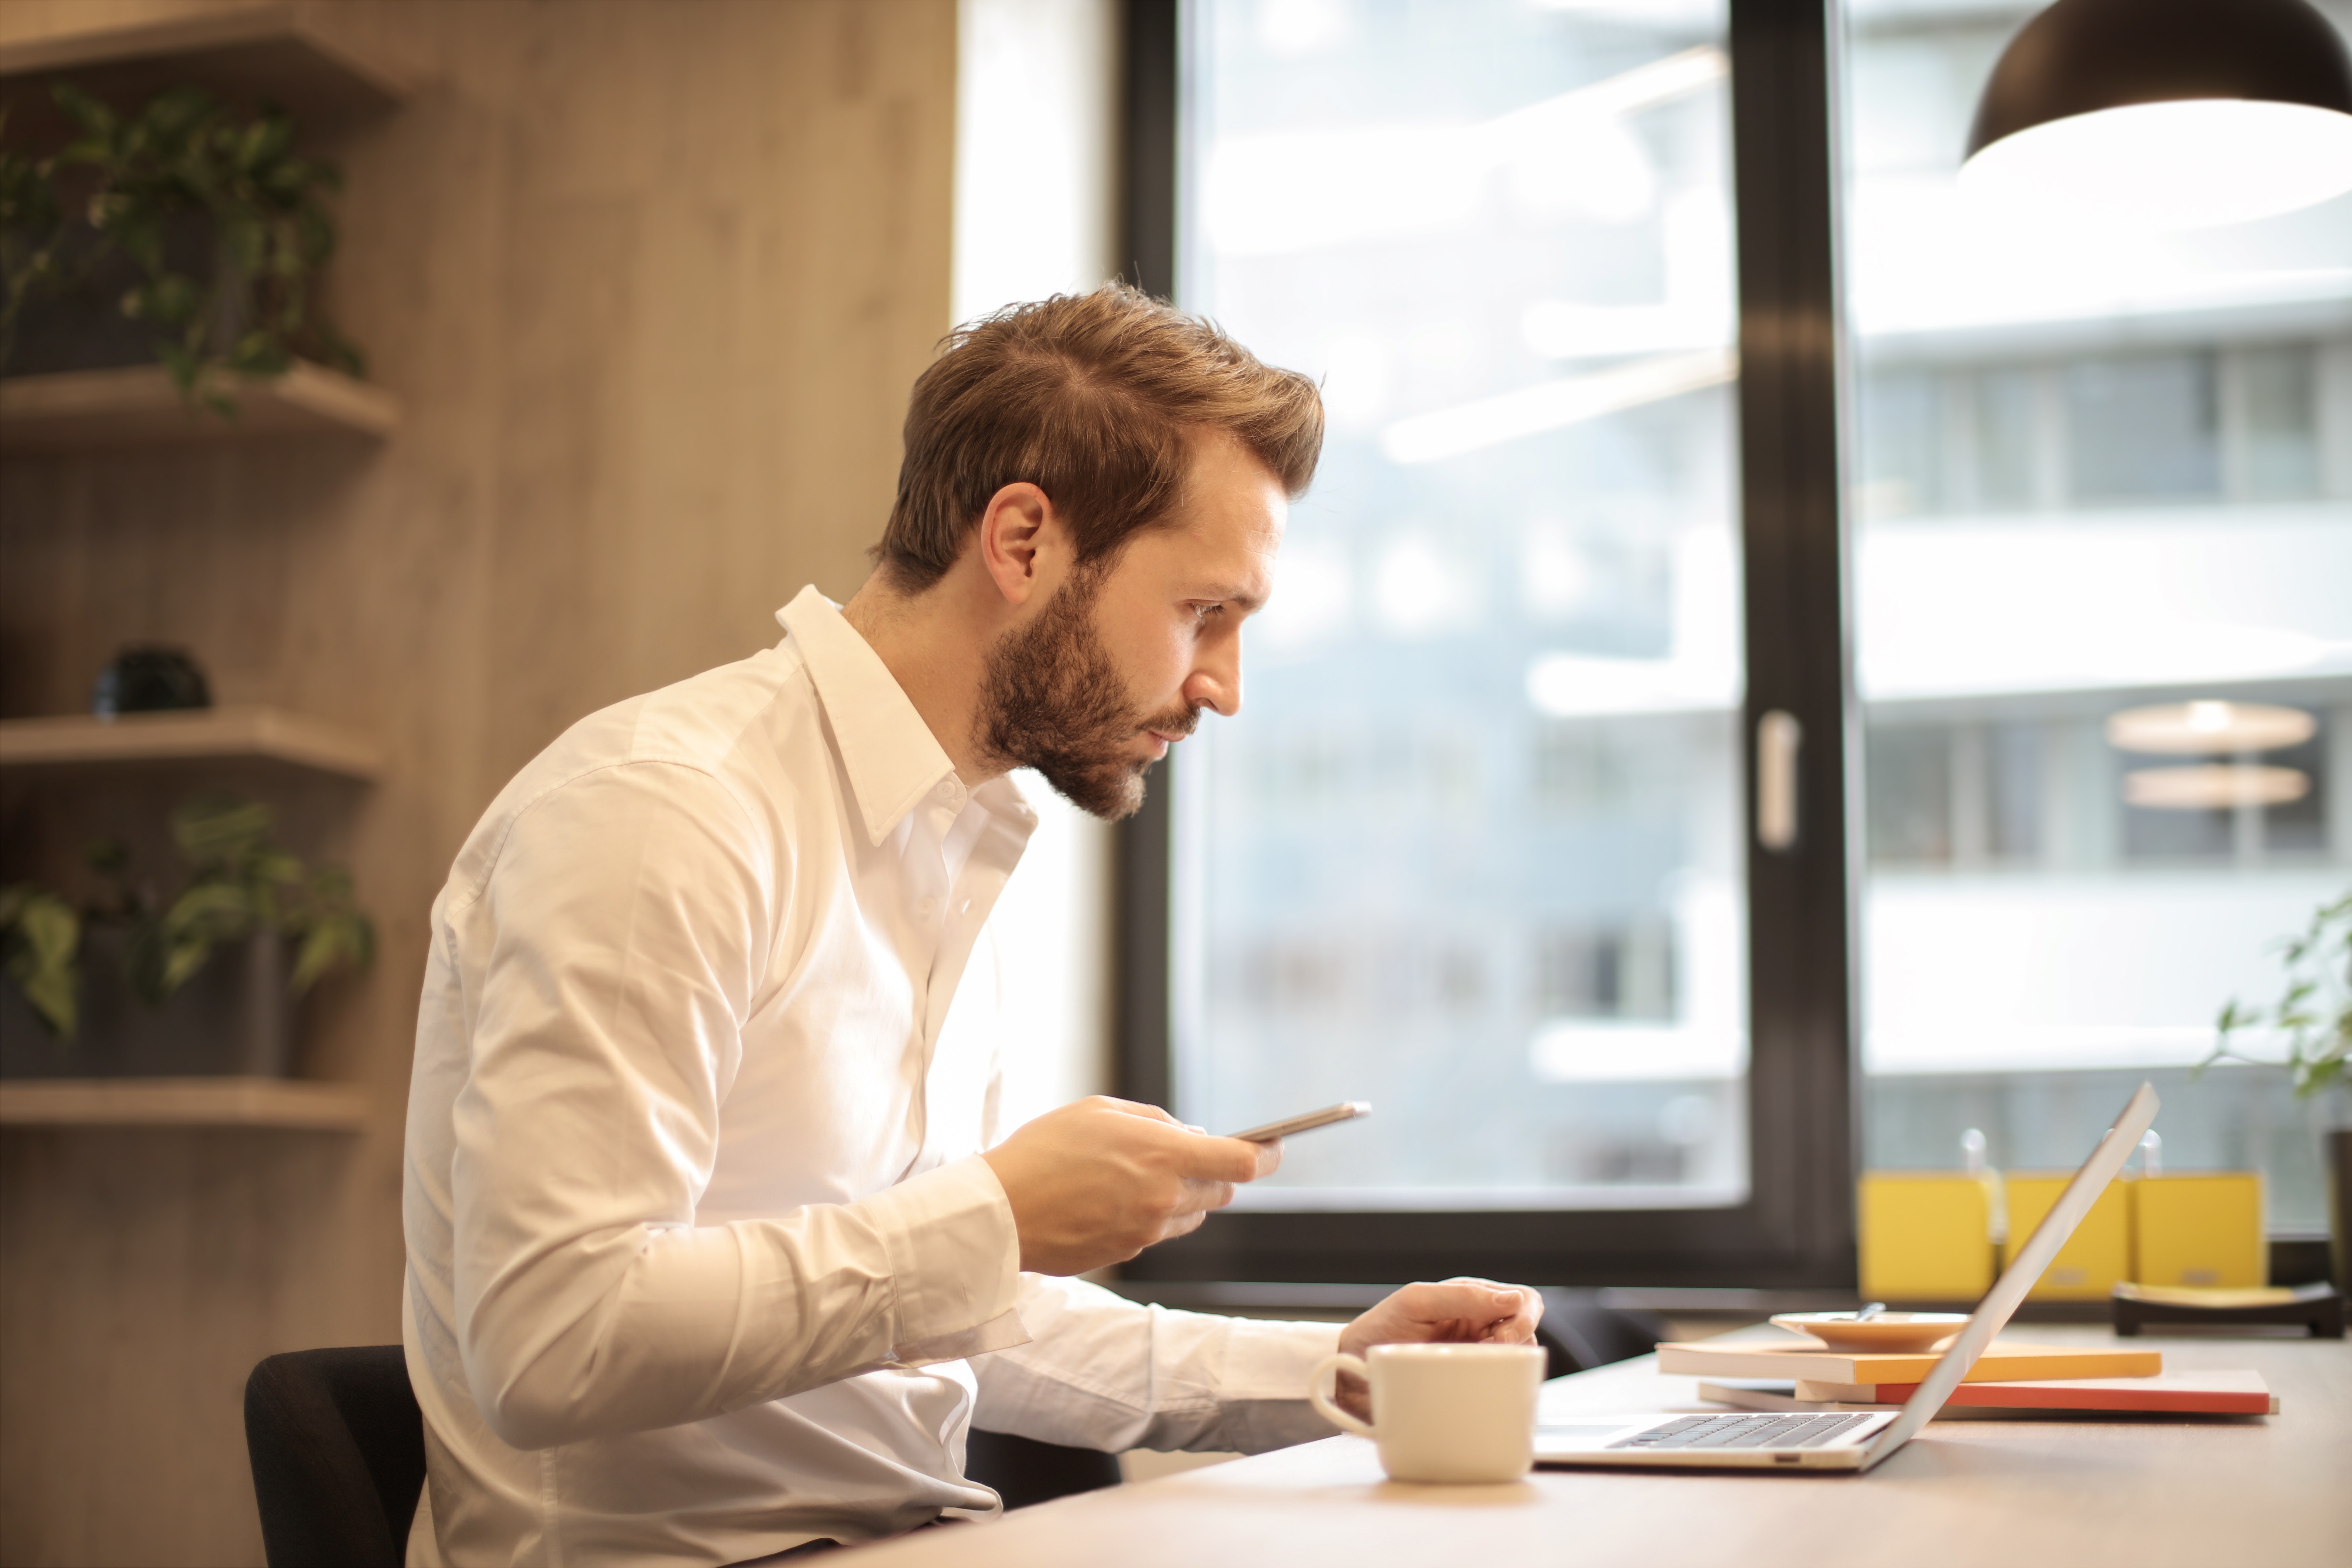 Man in White Dress Shirt, Beard, Window, Technology, Table, HQ Photo